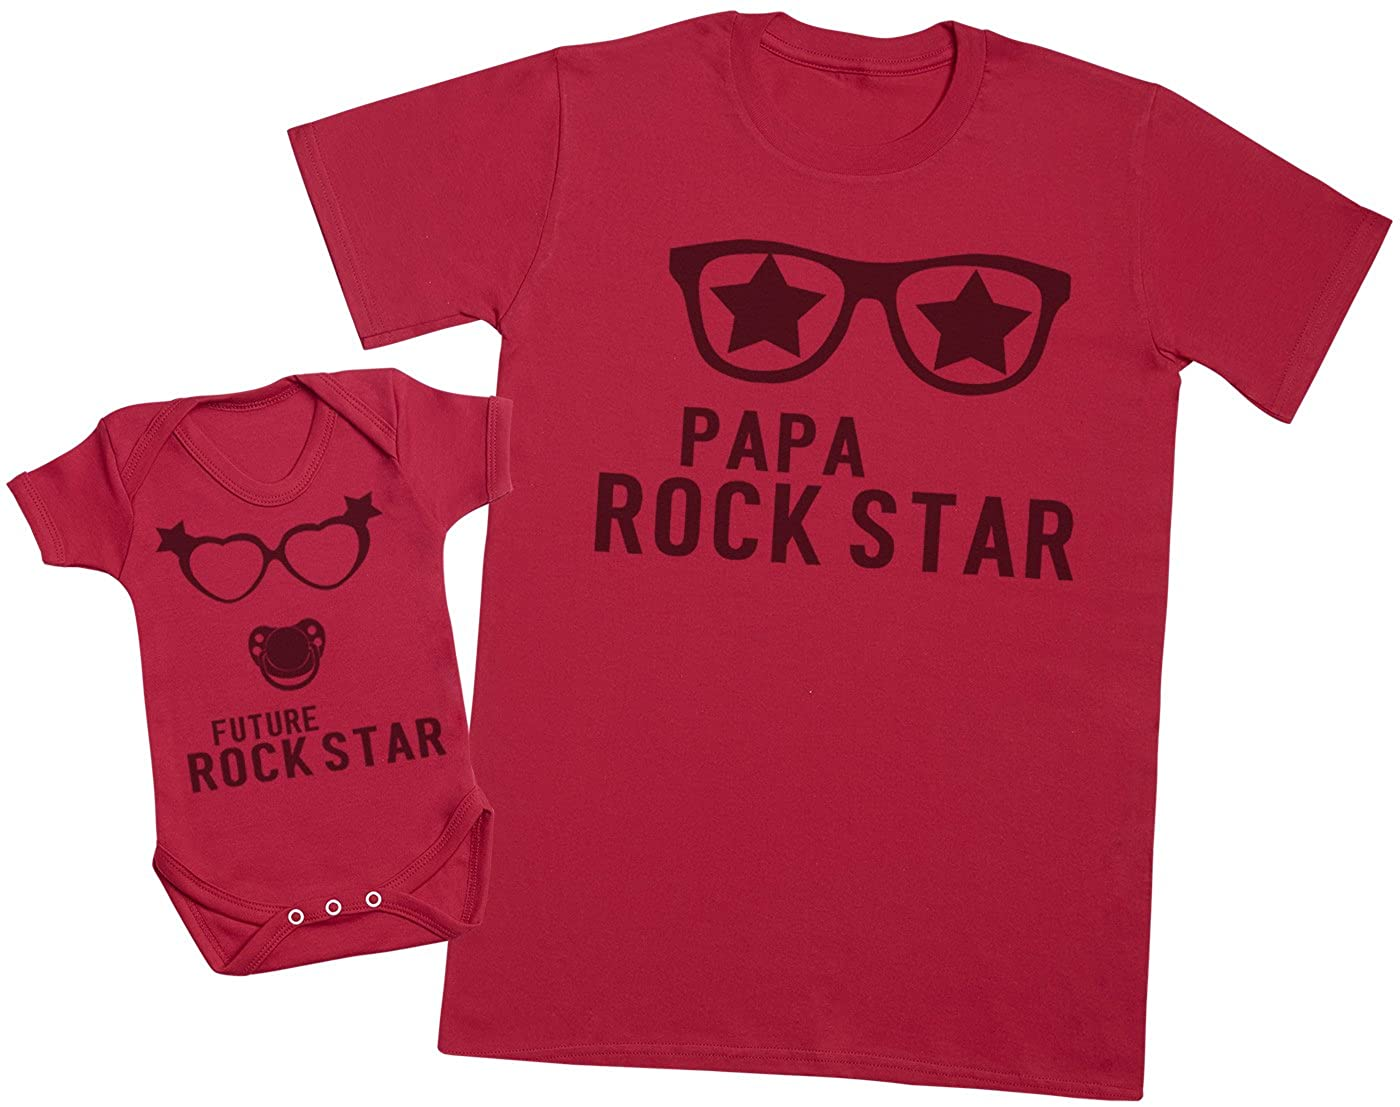 Ensemble P/ère B/éb/é Cadeau Hommes T-Shirt /& Body b/éb/é Future Rock Star Fille